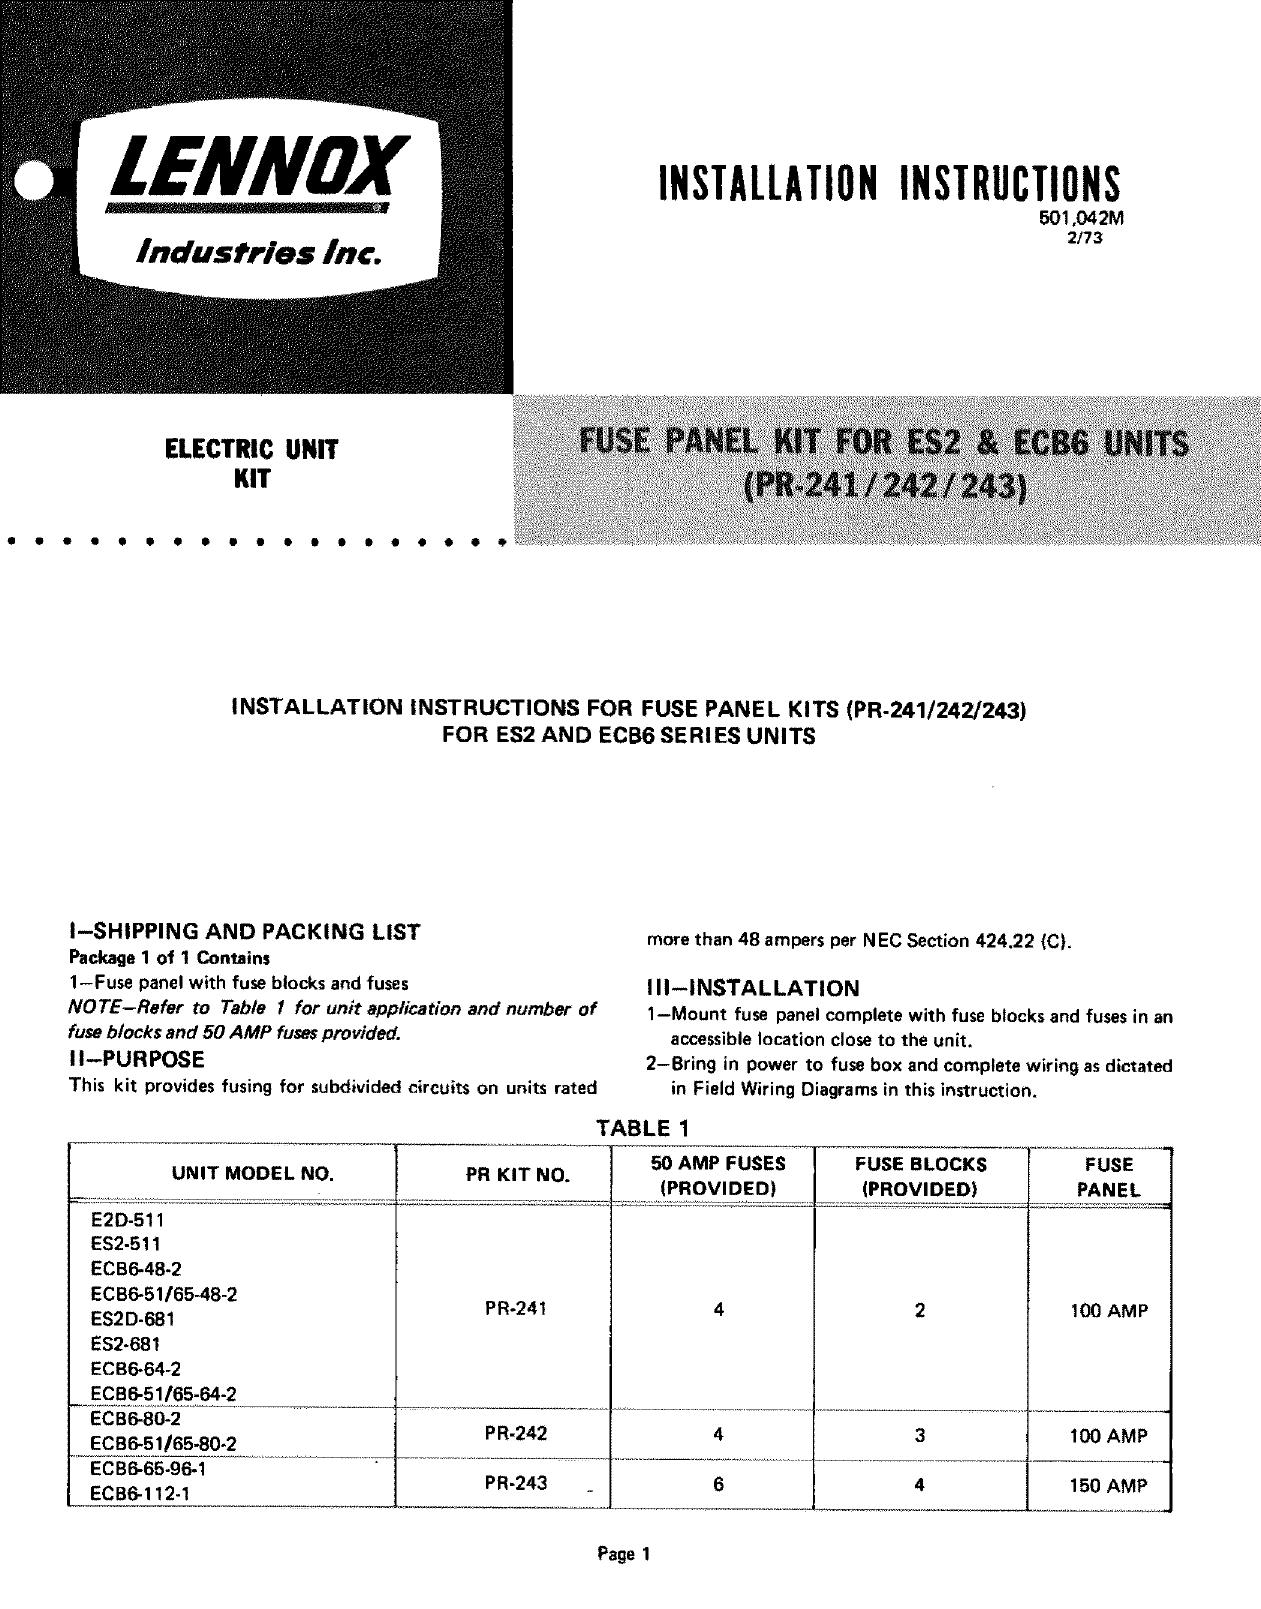 Lennox Air Handler Auxiliary Heater Kit Manual L0805596 150 Amp Fuse Box